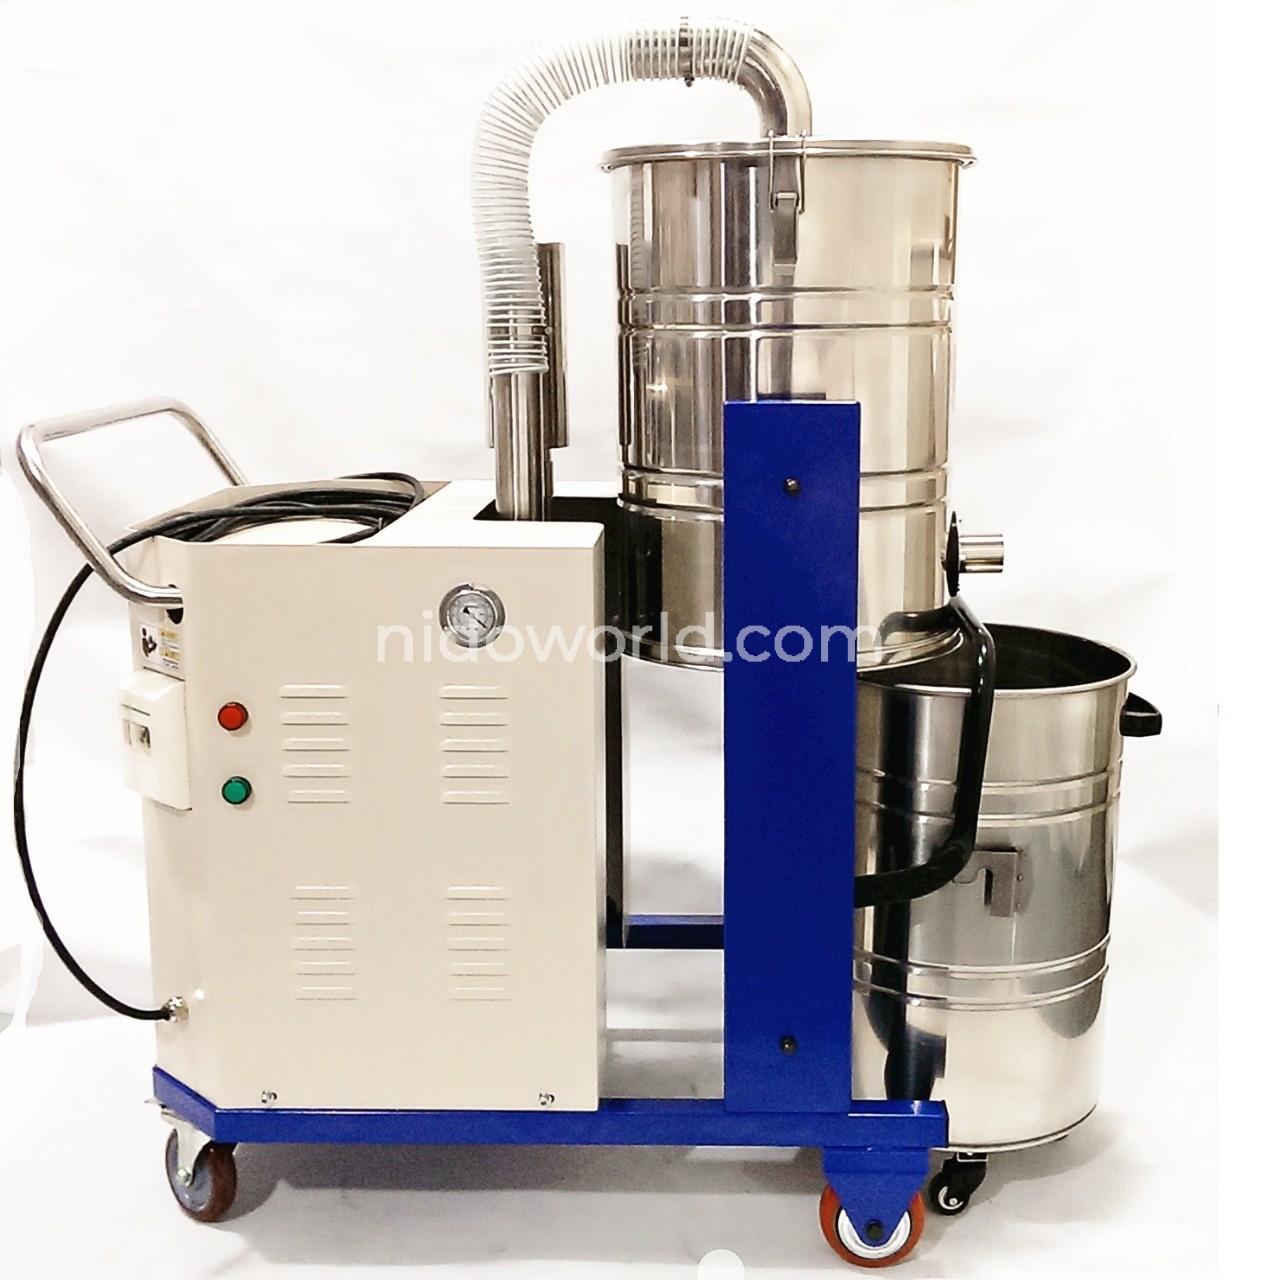 Industrial Wet Amp Dry Vacuum Cleaner 3 Phase Nido